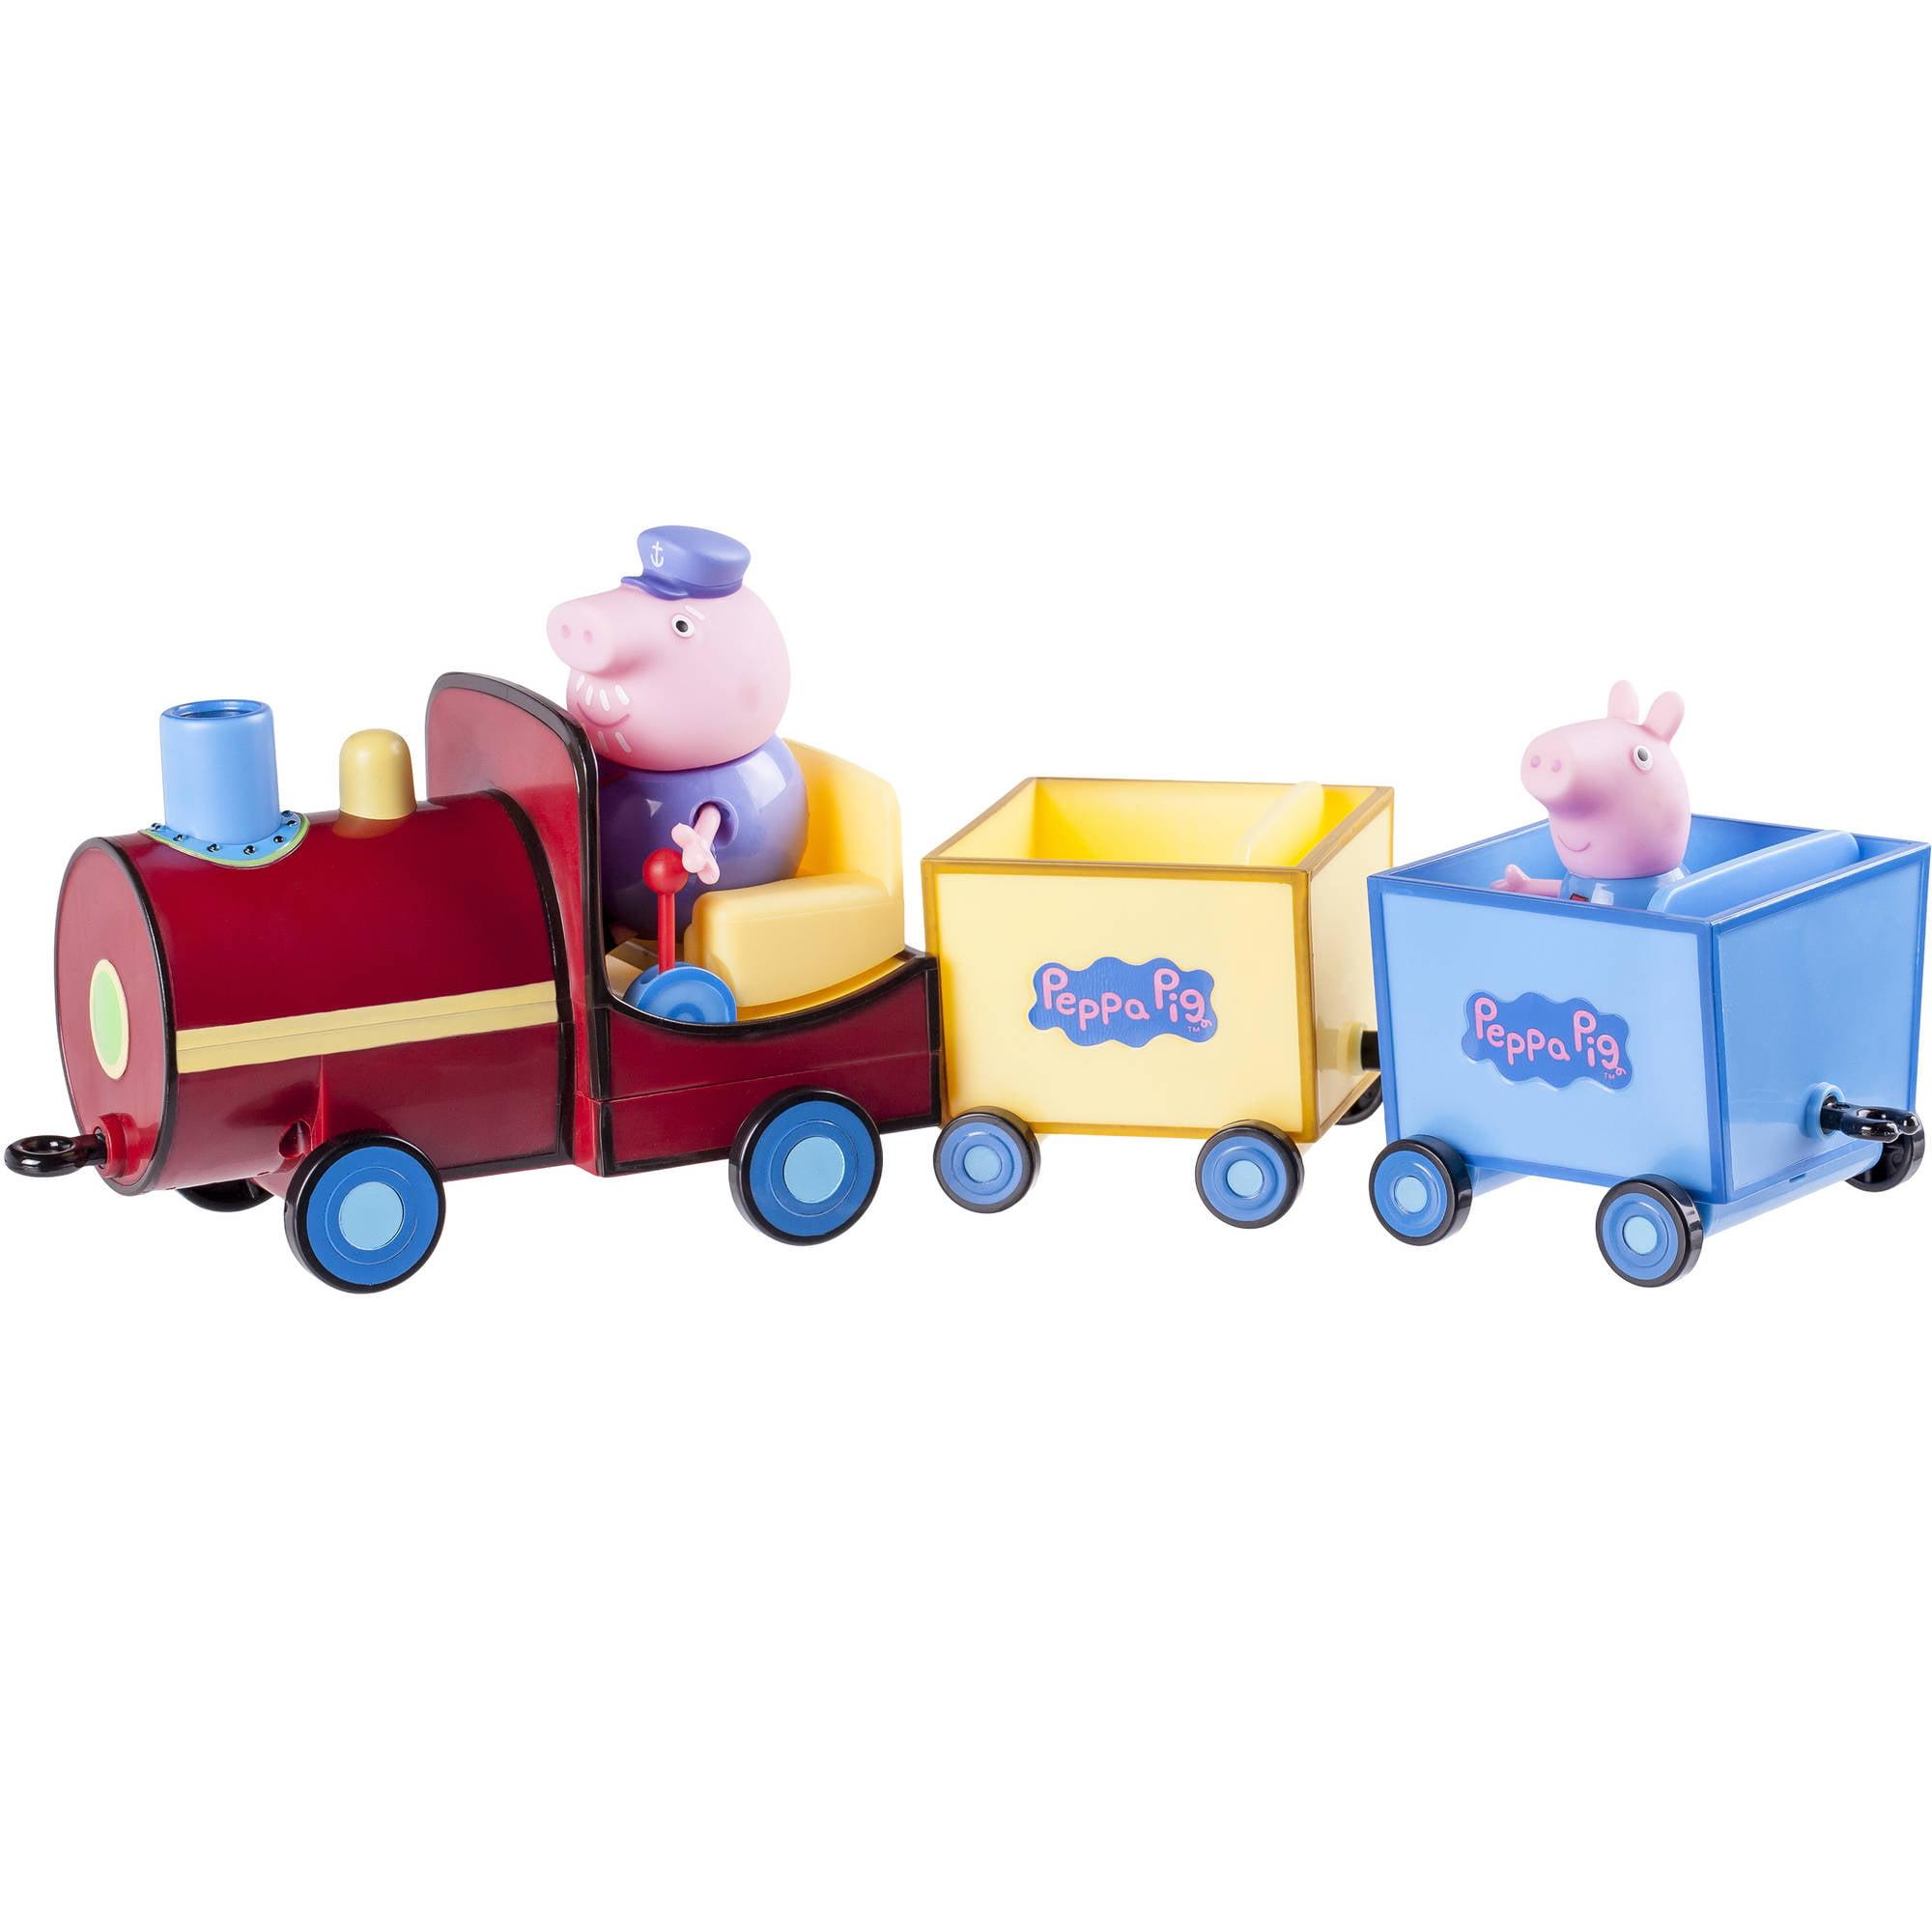 Peppa Pig Grandpa Train with 3 Figures